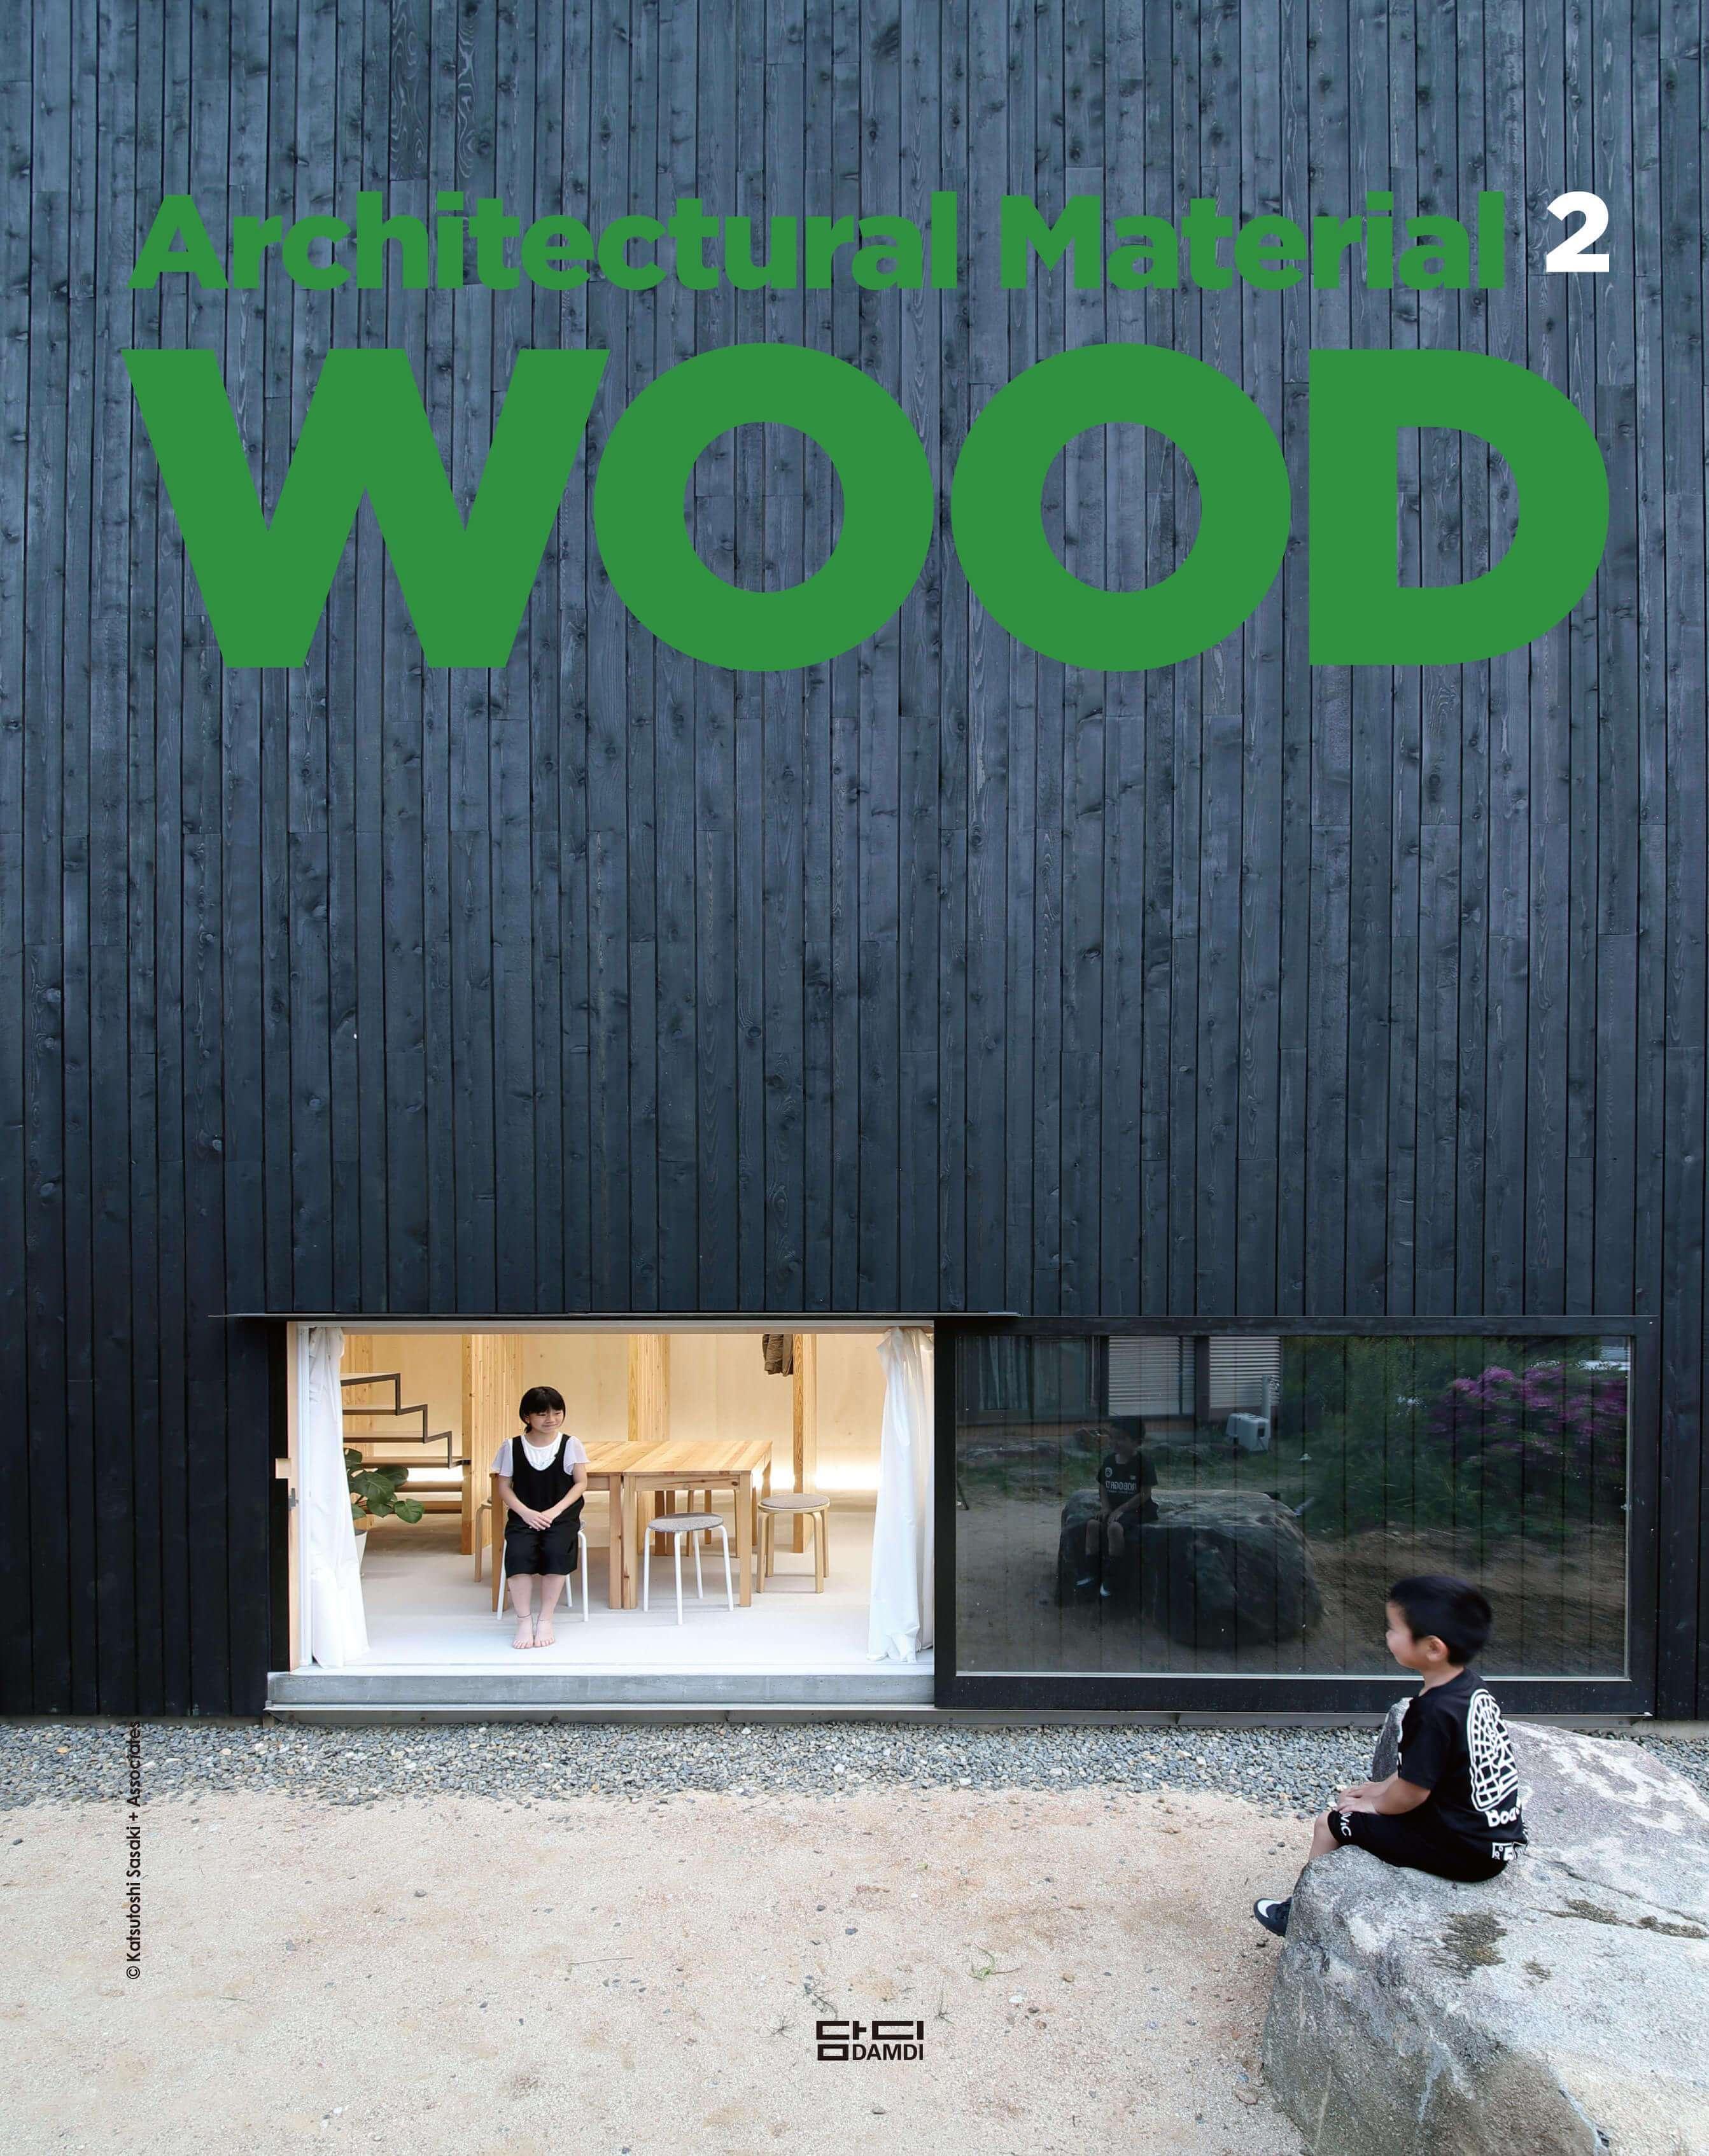 obra publicada - portada Architectural Material 2 - WOOD -DAMDI Publishing House - Clínica Dental LANDÍNEZ+REY arquitecto